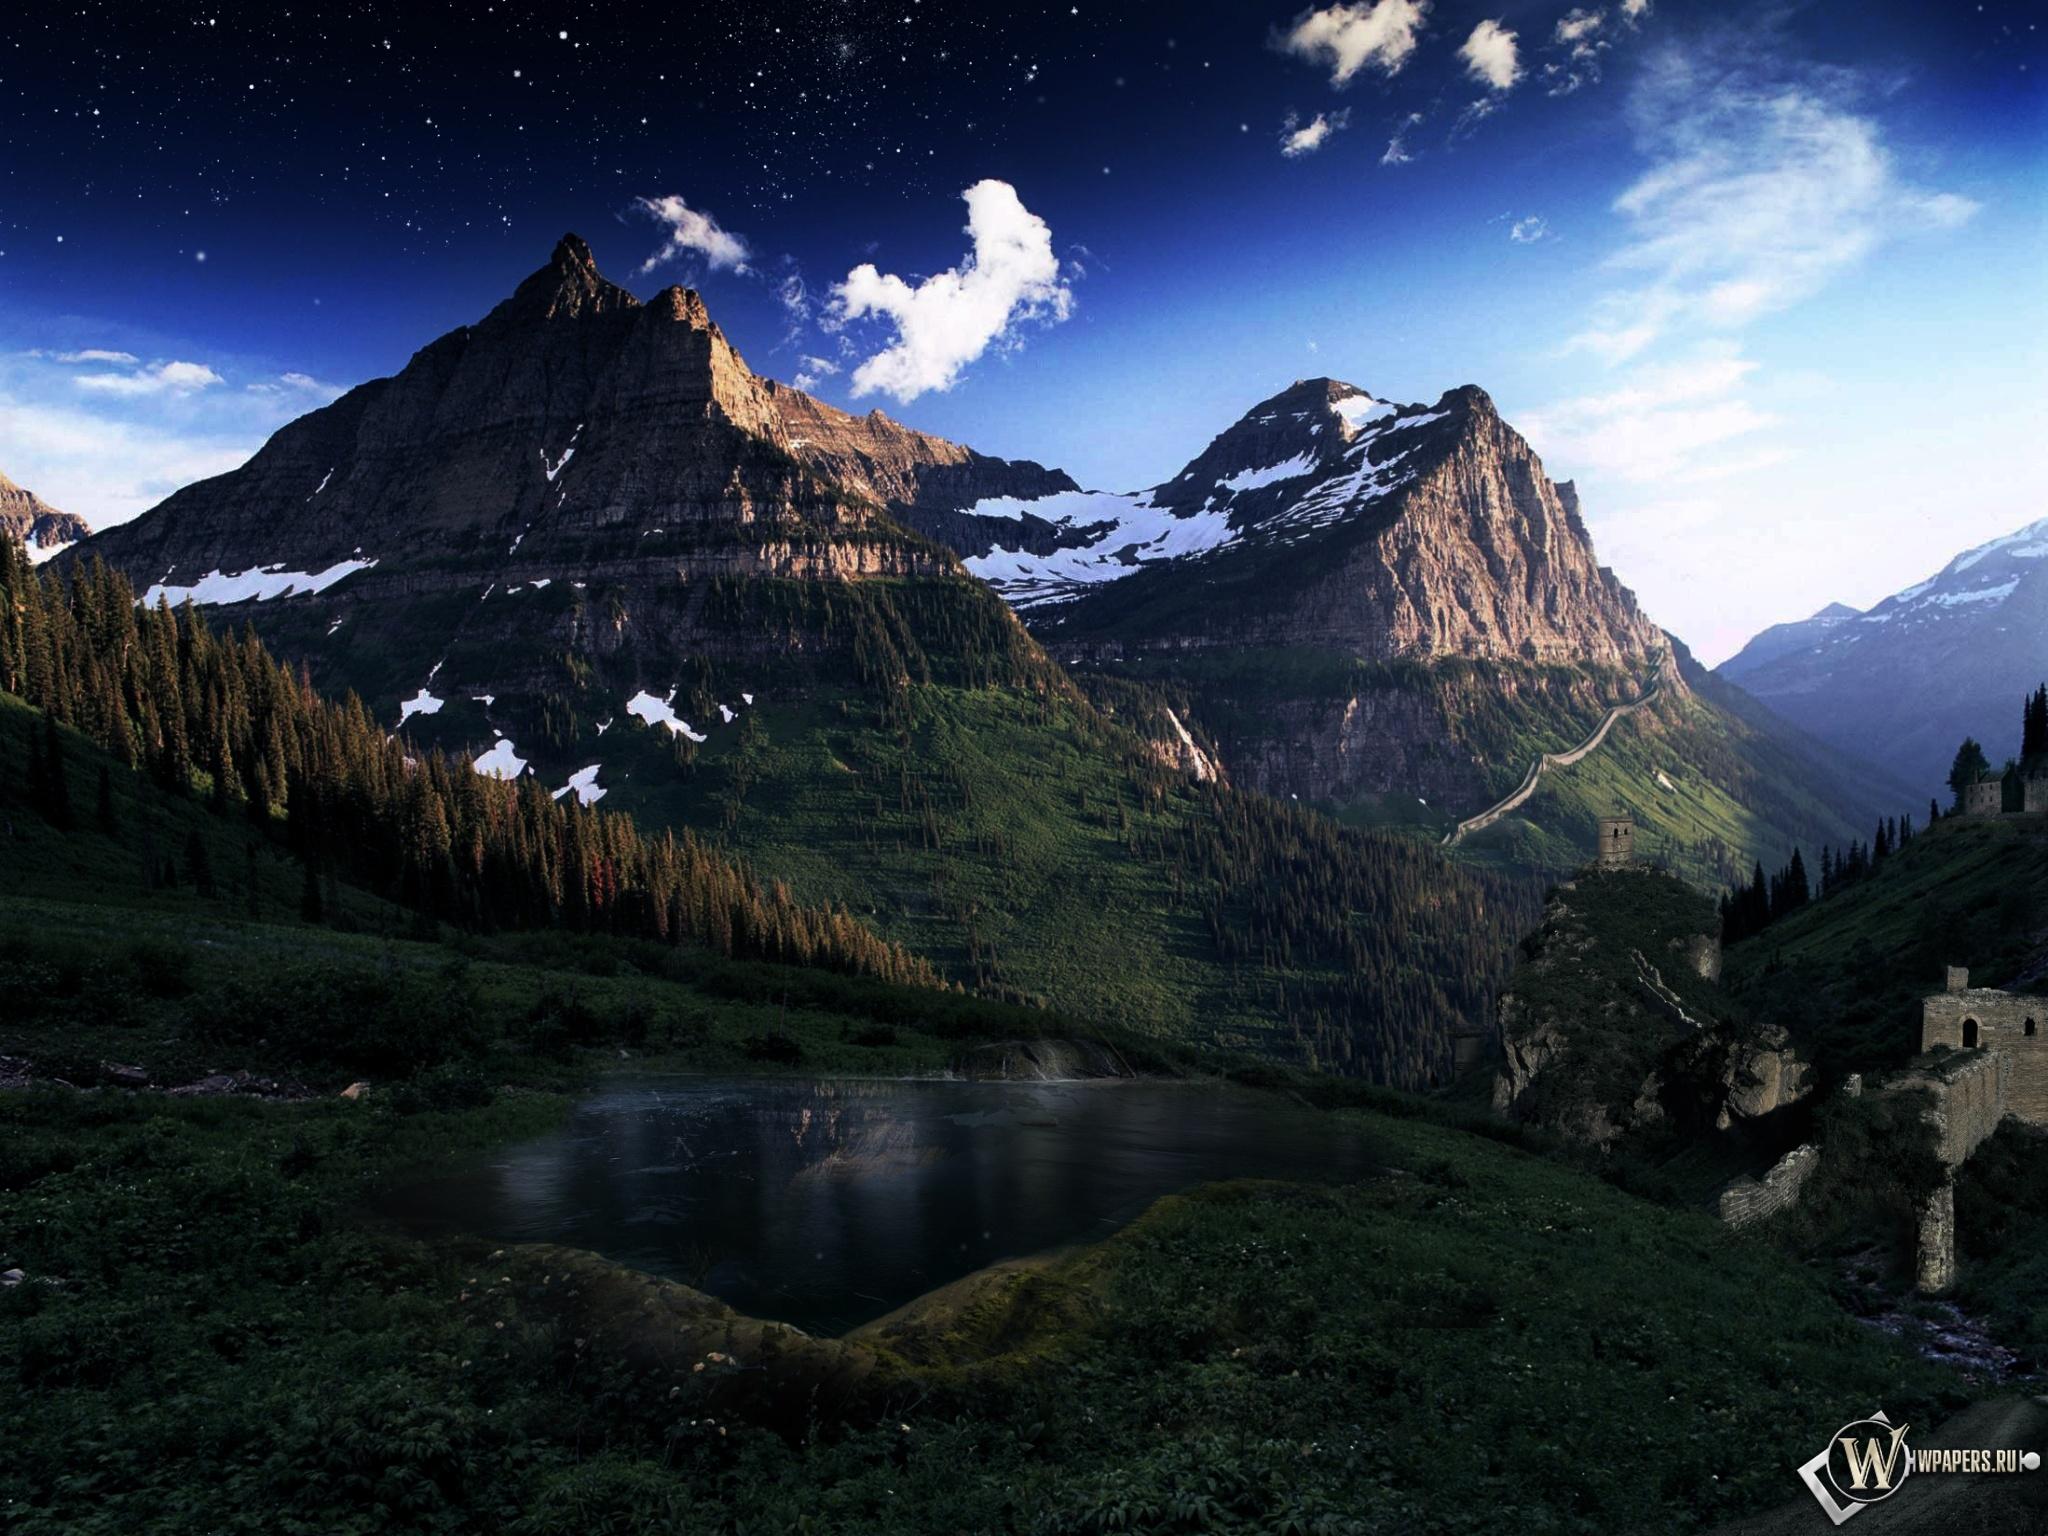 Сумерки в горах 2048x1536